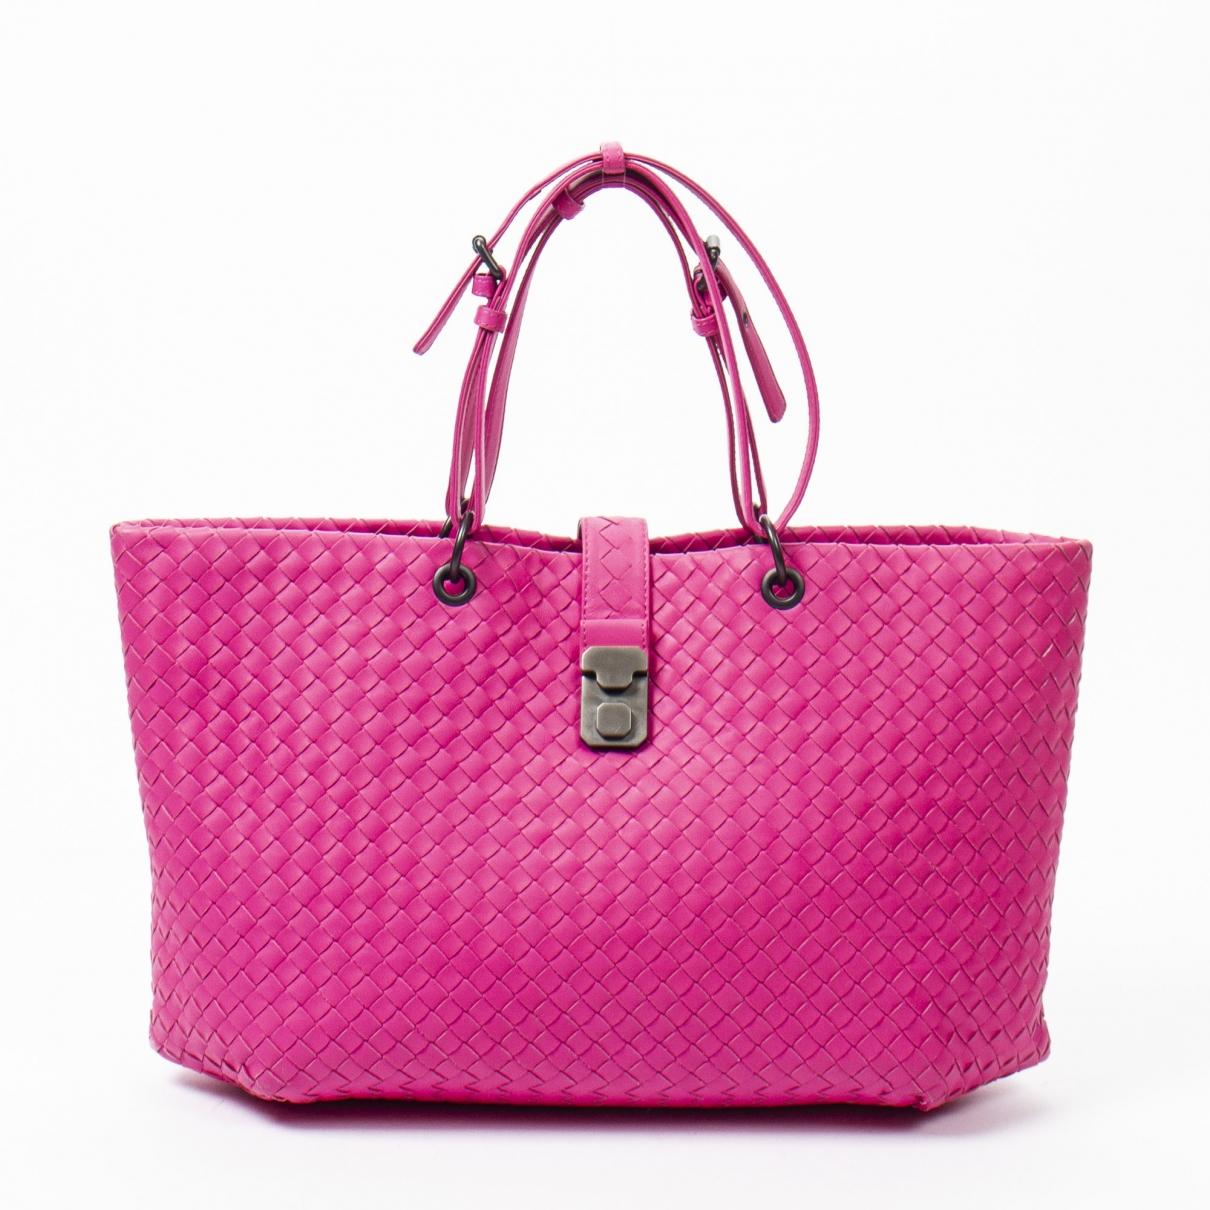 Bottega Veneta \N Handtasche in  Rosa Leder